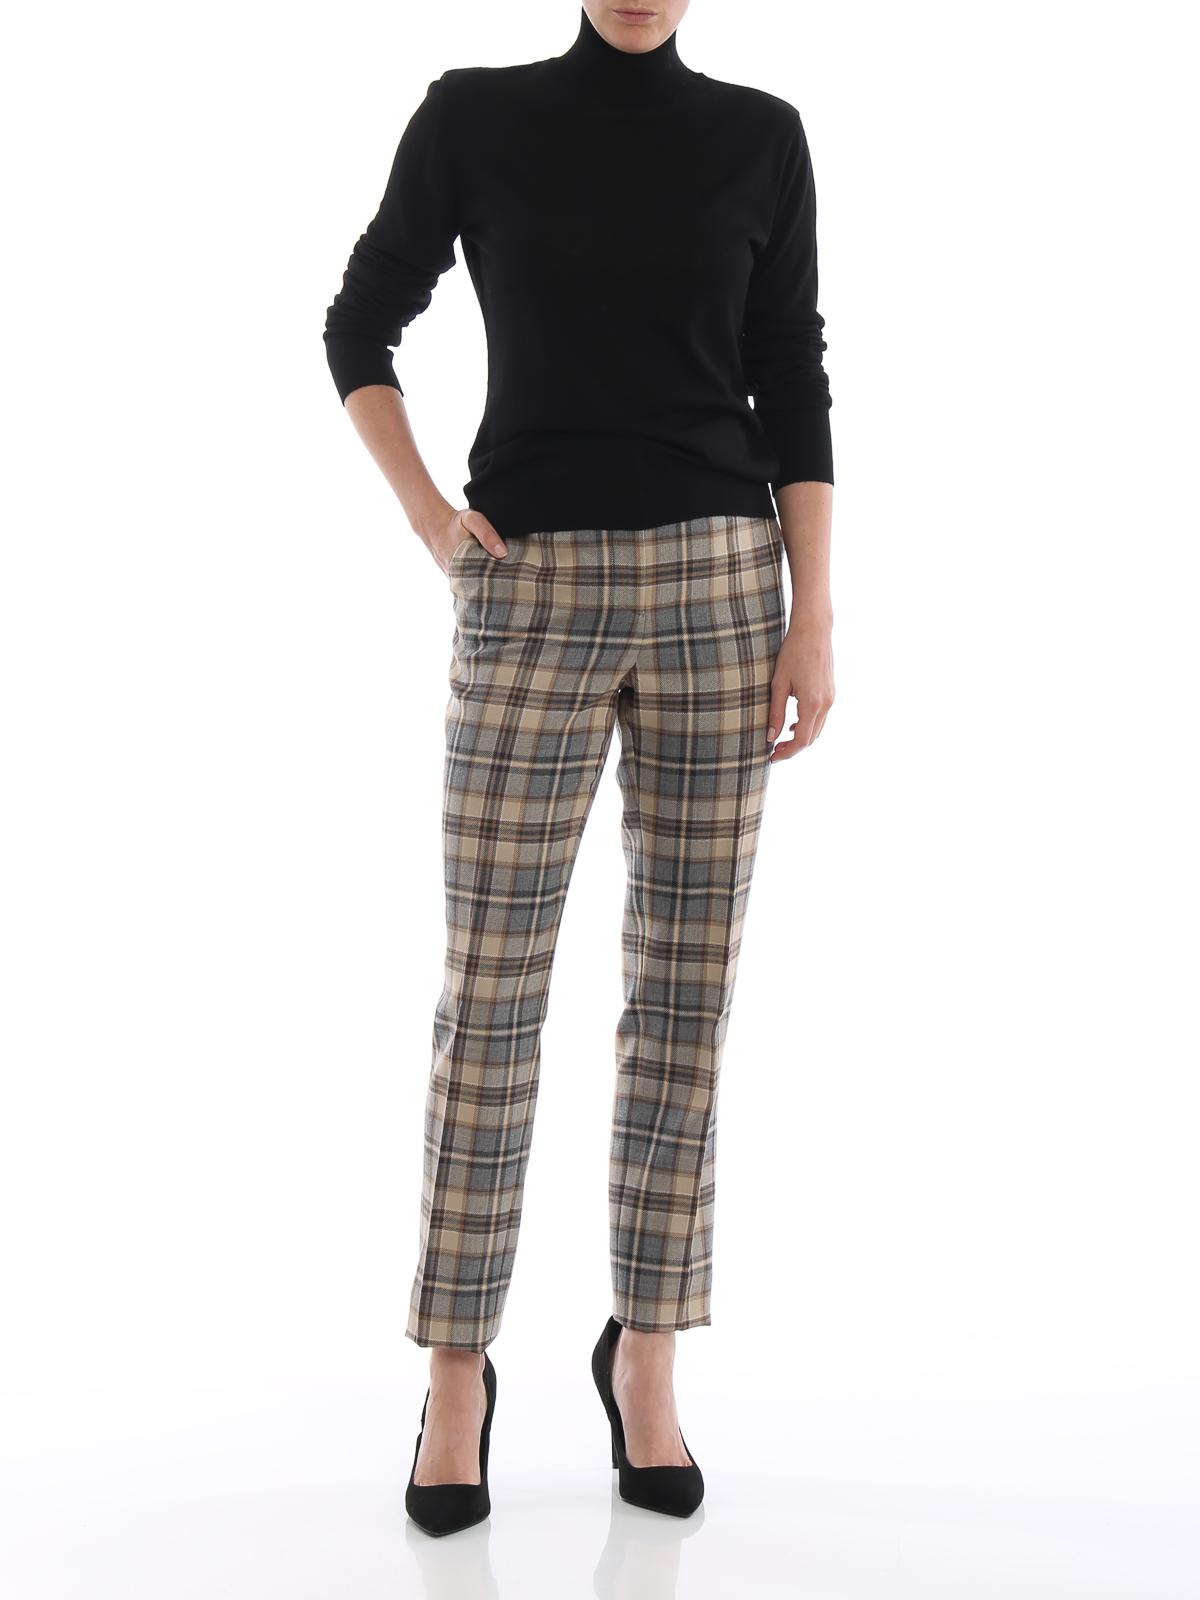 69779c5de6e alberta-ferretti-online-tailored--formal-trousers-grey-and-beige -check-wool-cigarette-trousers-00000135814f00s002.jpg